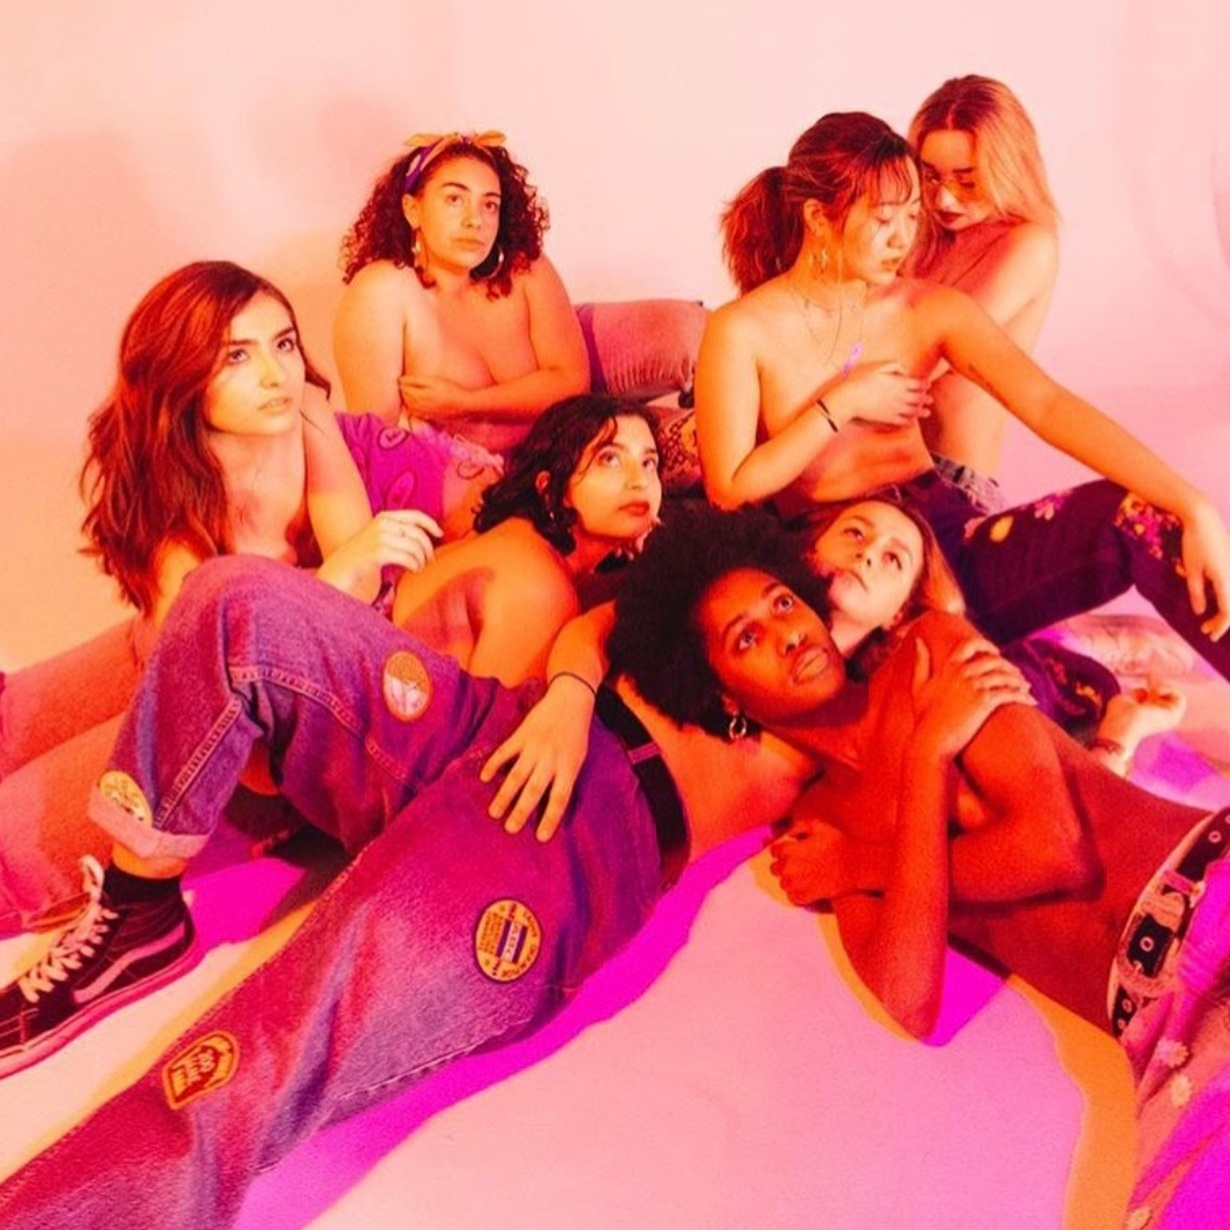 Photographer:  Tori Pante  · (Role)Models:  Vera,   Millie ,  Gia ,  Annette ,  Alice ,  Vanessa